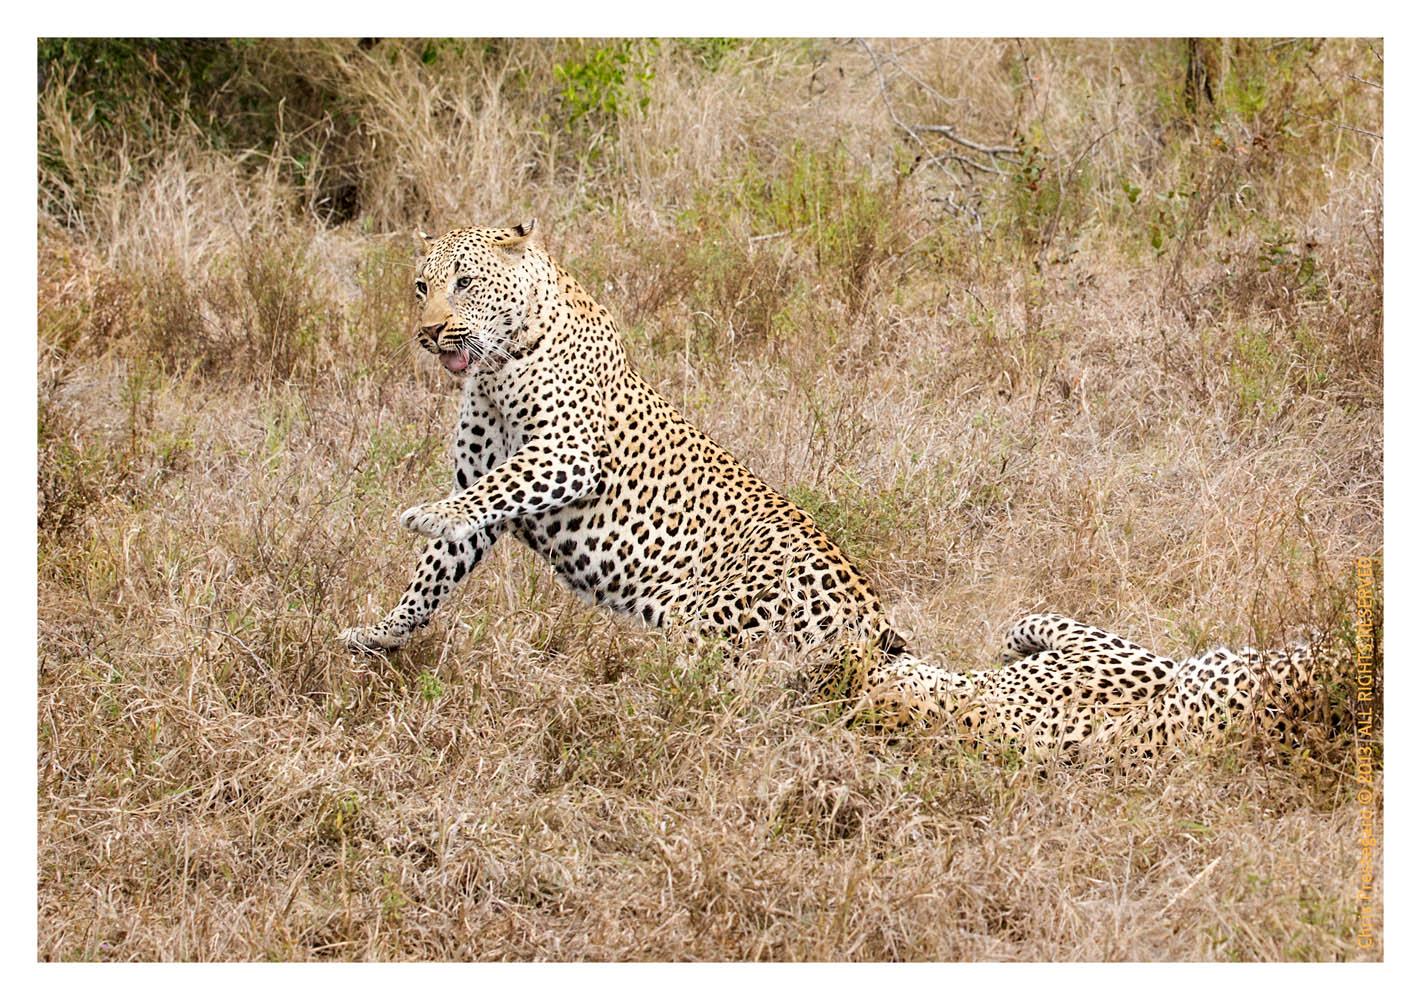 LeopardFight8121-Oct15-2013